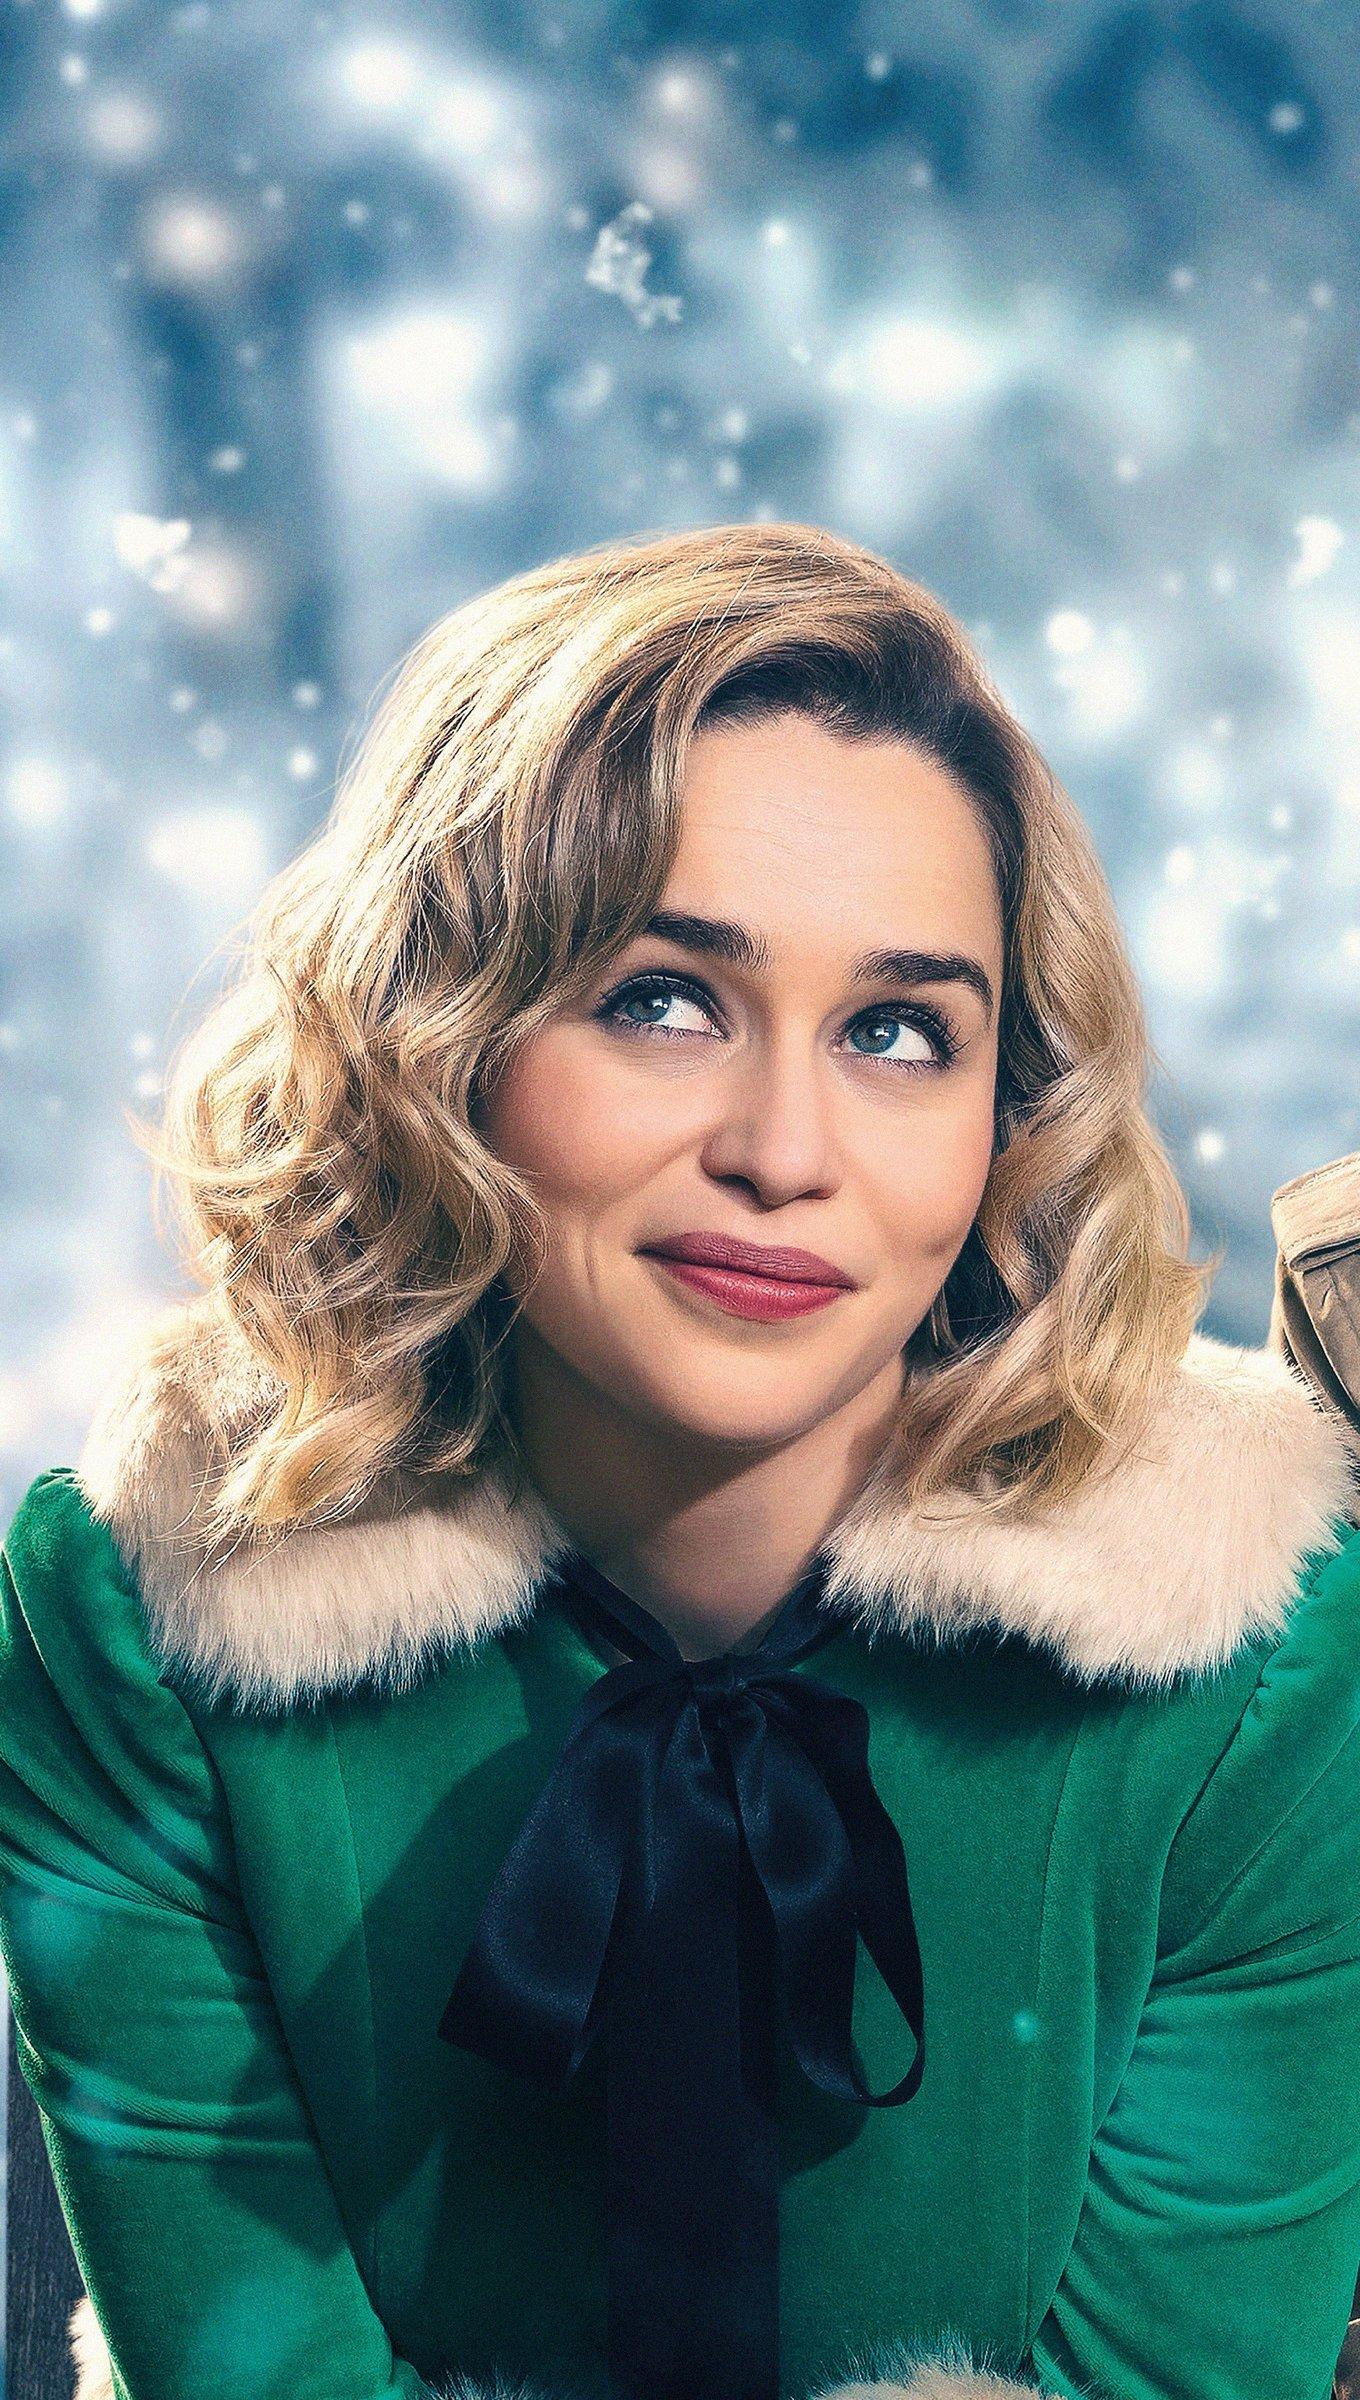 Wallpaper Last Christmas Movie Vertical